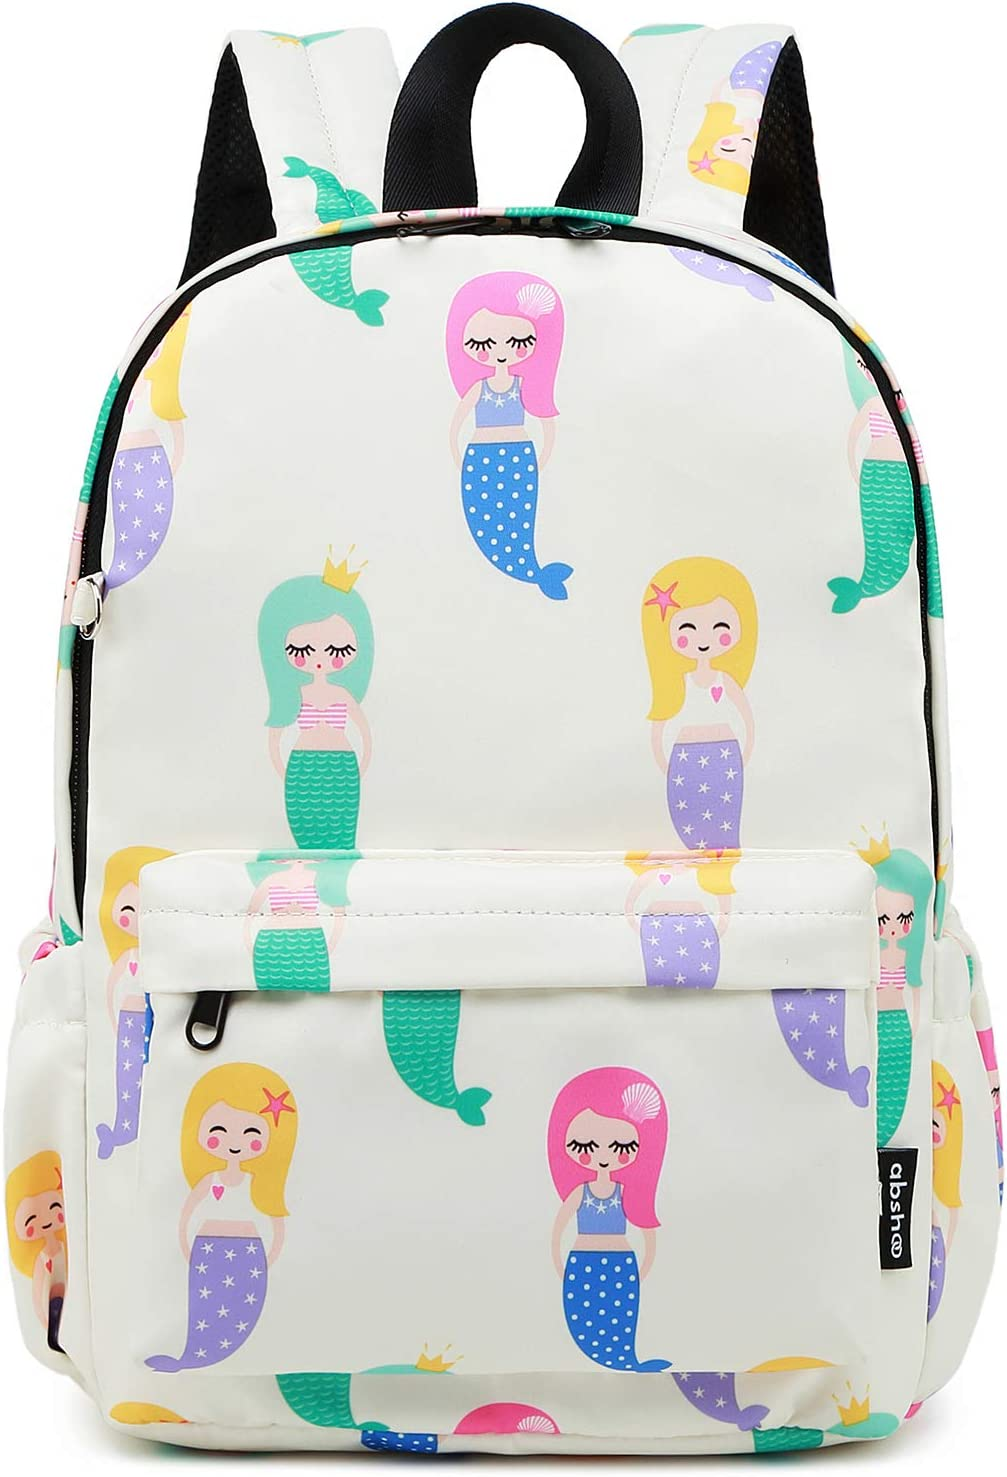 Abshoo Little Kids Mermaid Toddler Backpacks for Girls Preschool Backpack With Chest Strap (Mermaid Beige)